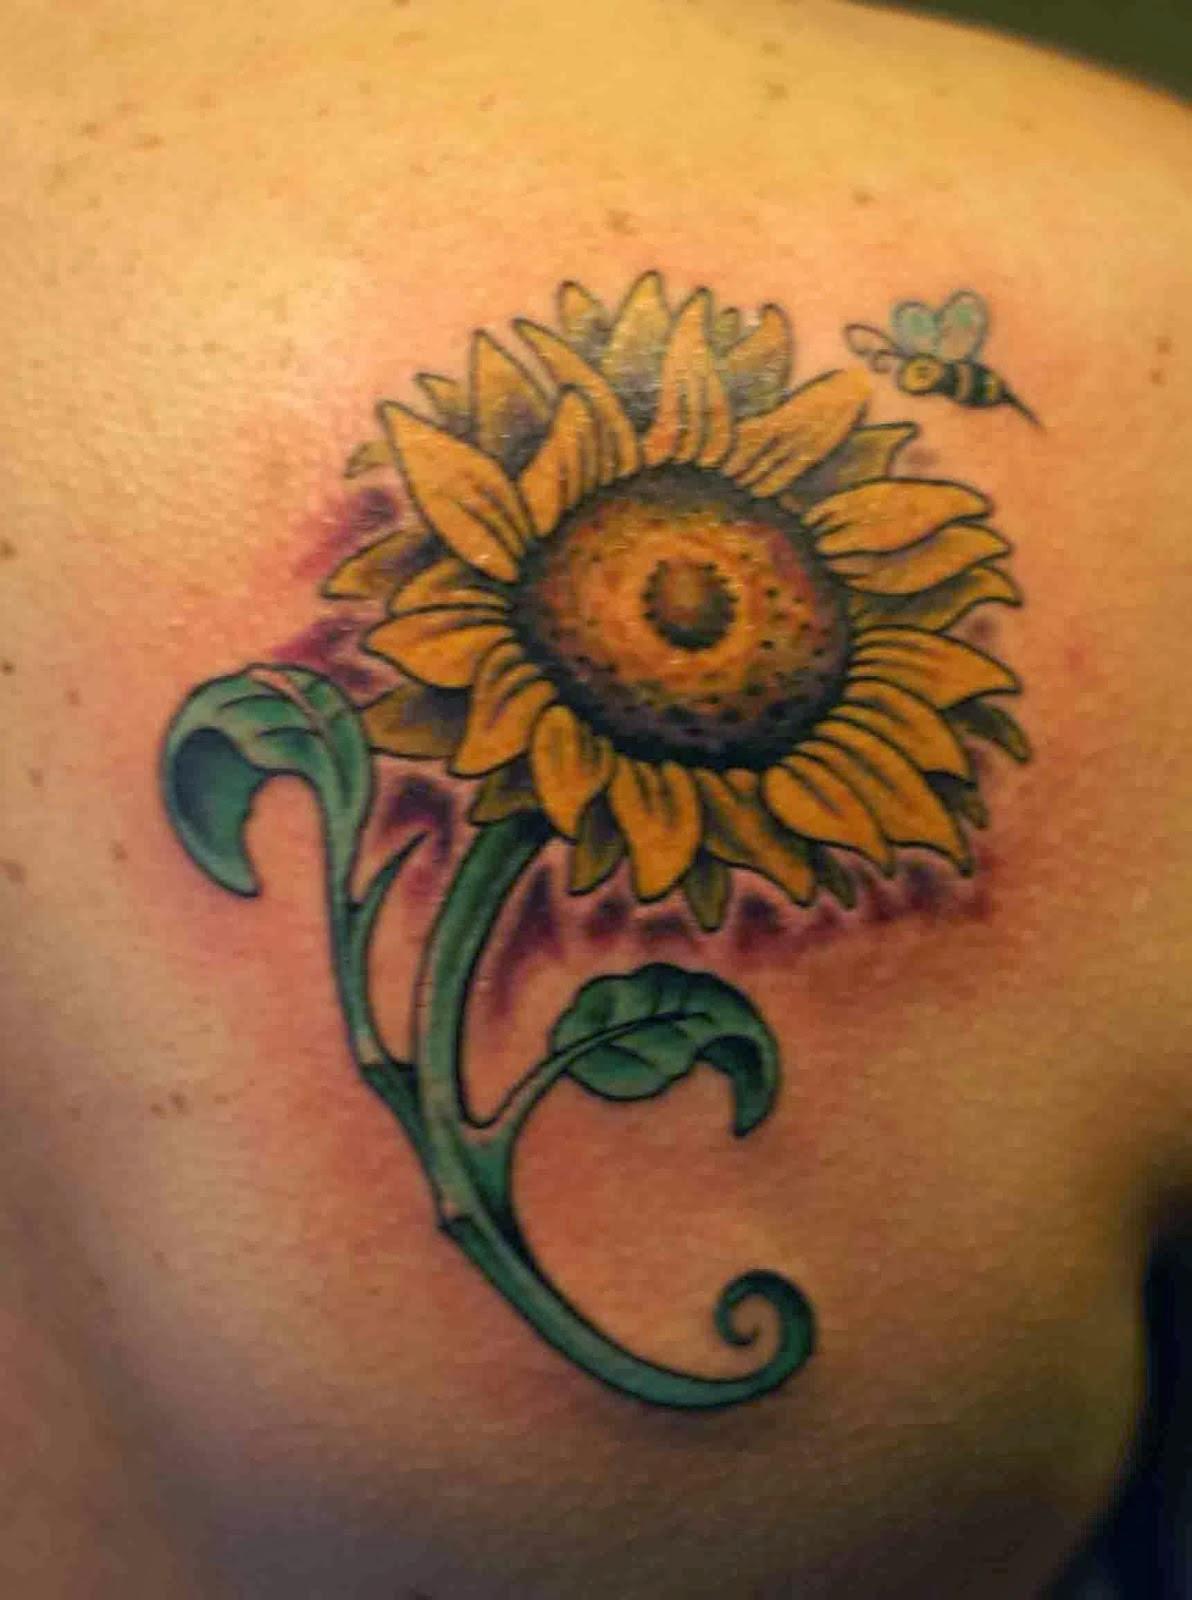 Sunflower And Daisy Tattoo: Sunflower Tattoos